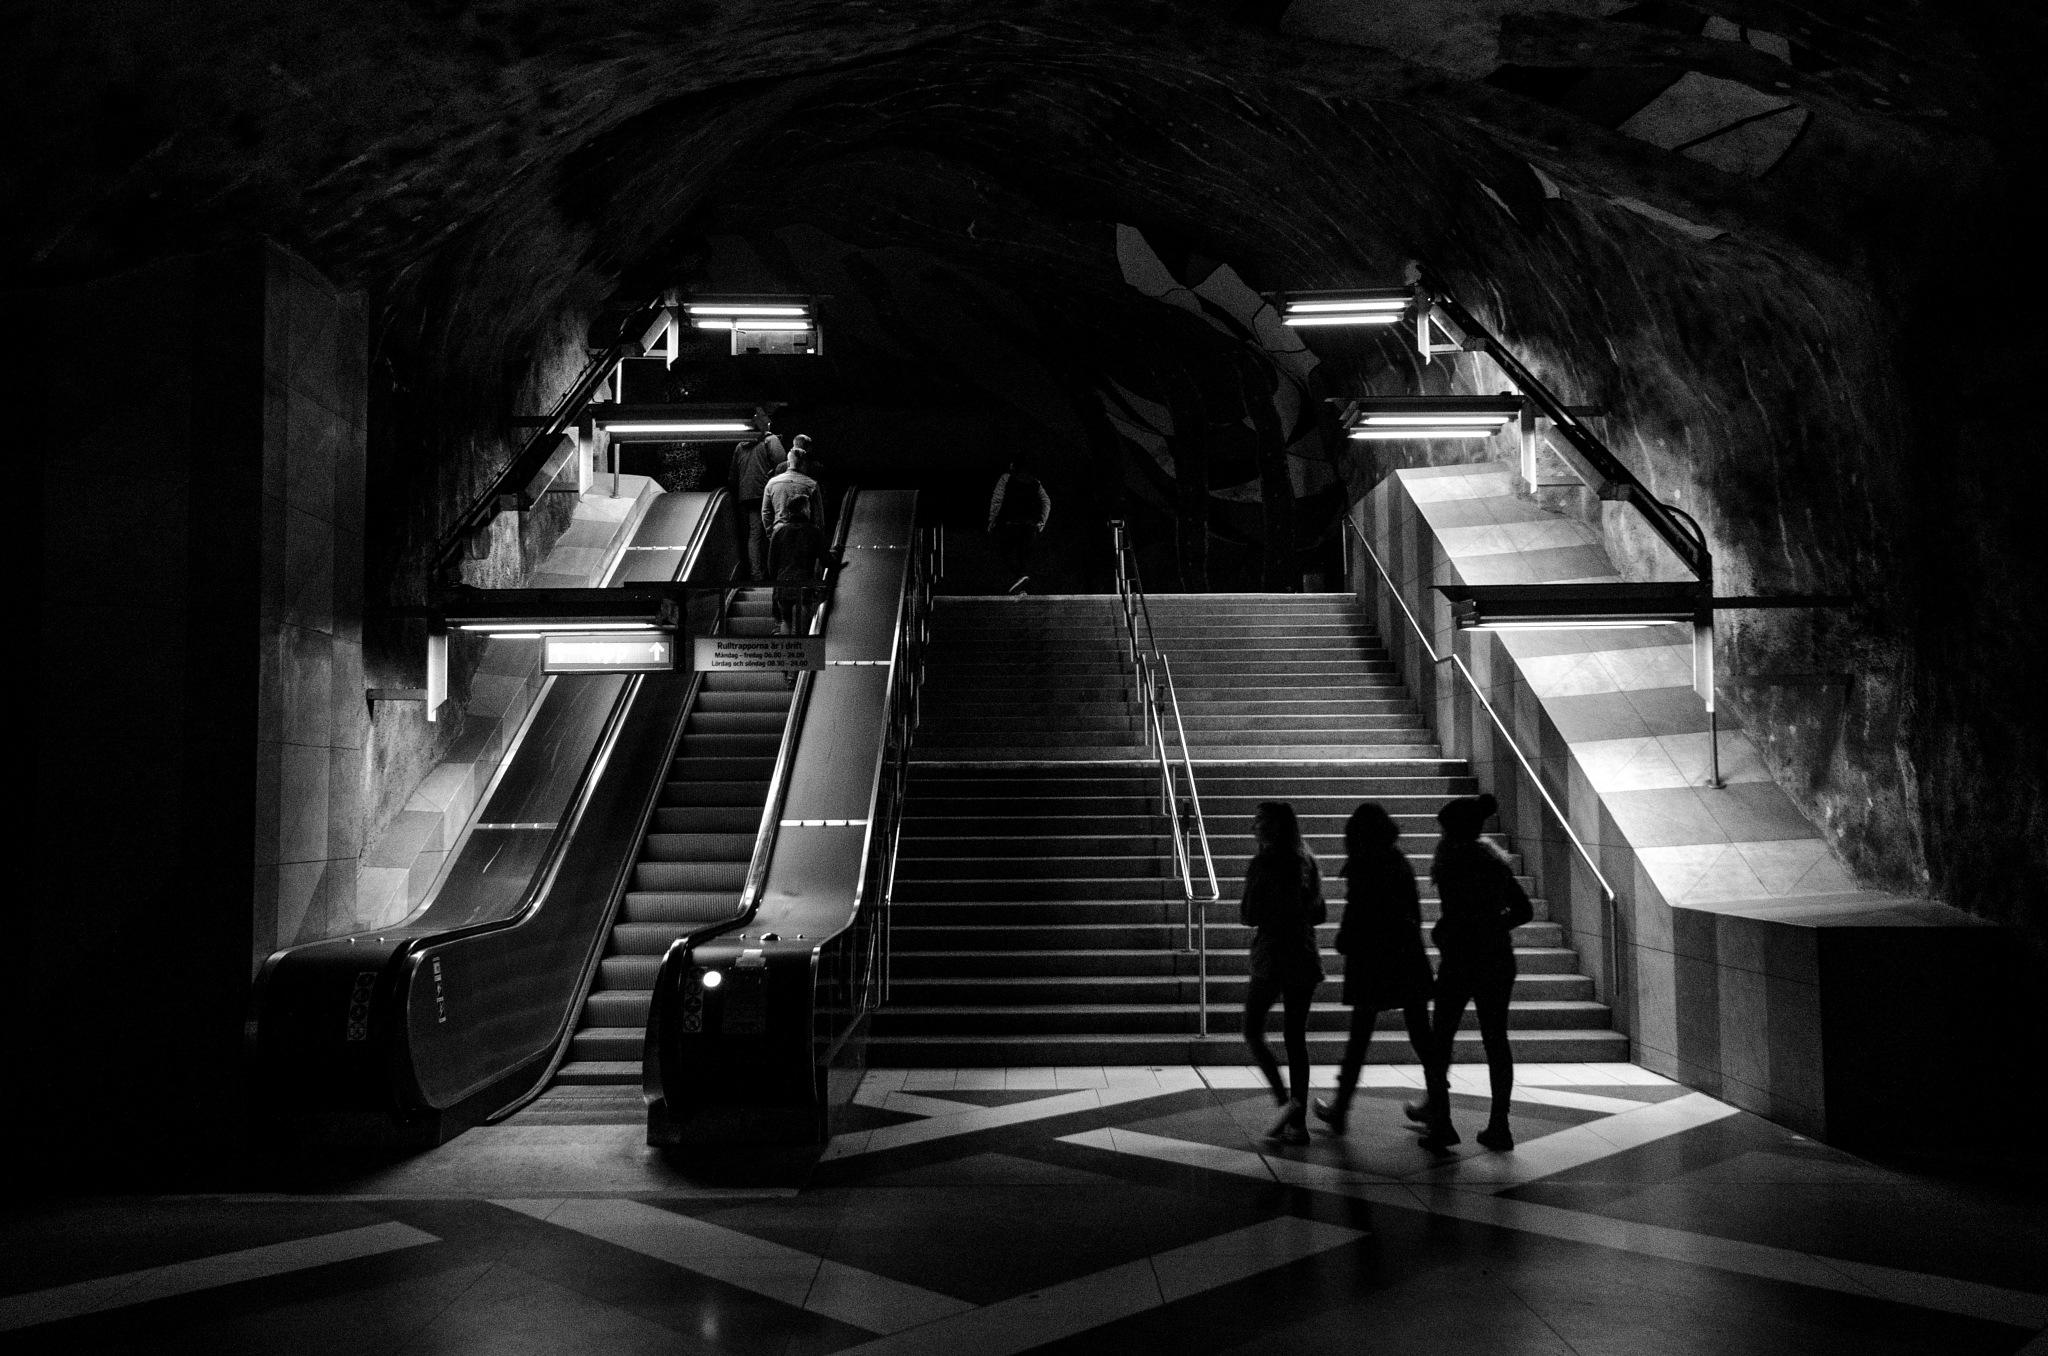 Leaving by Frederic Paulussen